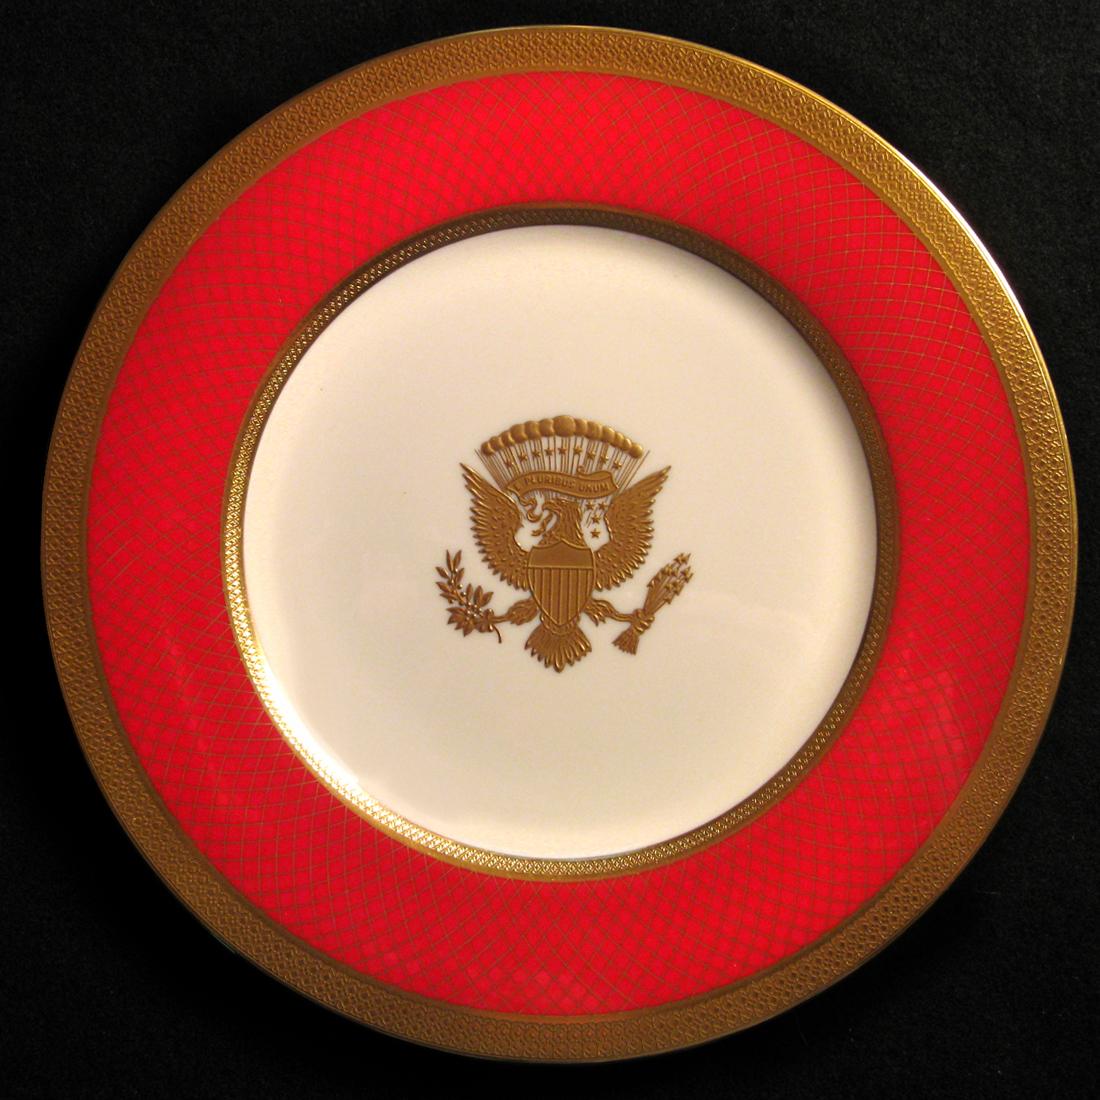 RONALD NANCY REAGAN WHITE HOUSE CHINA PLATE